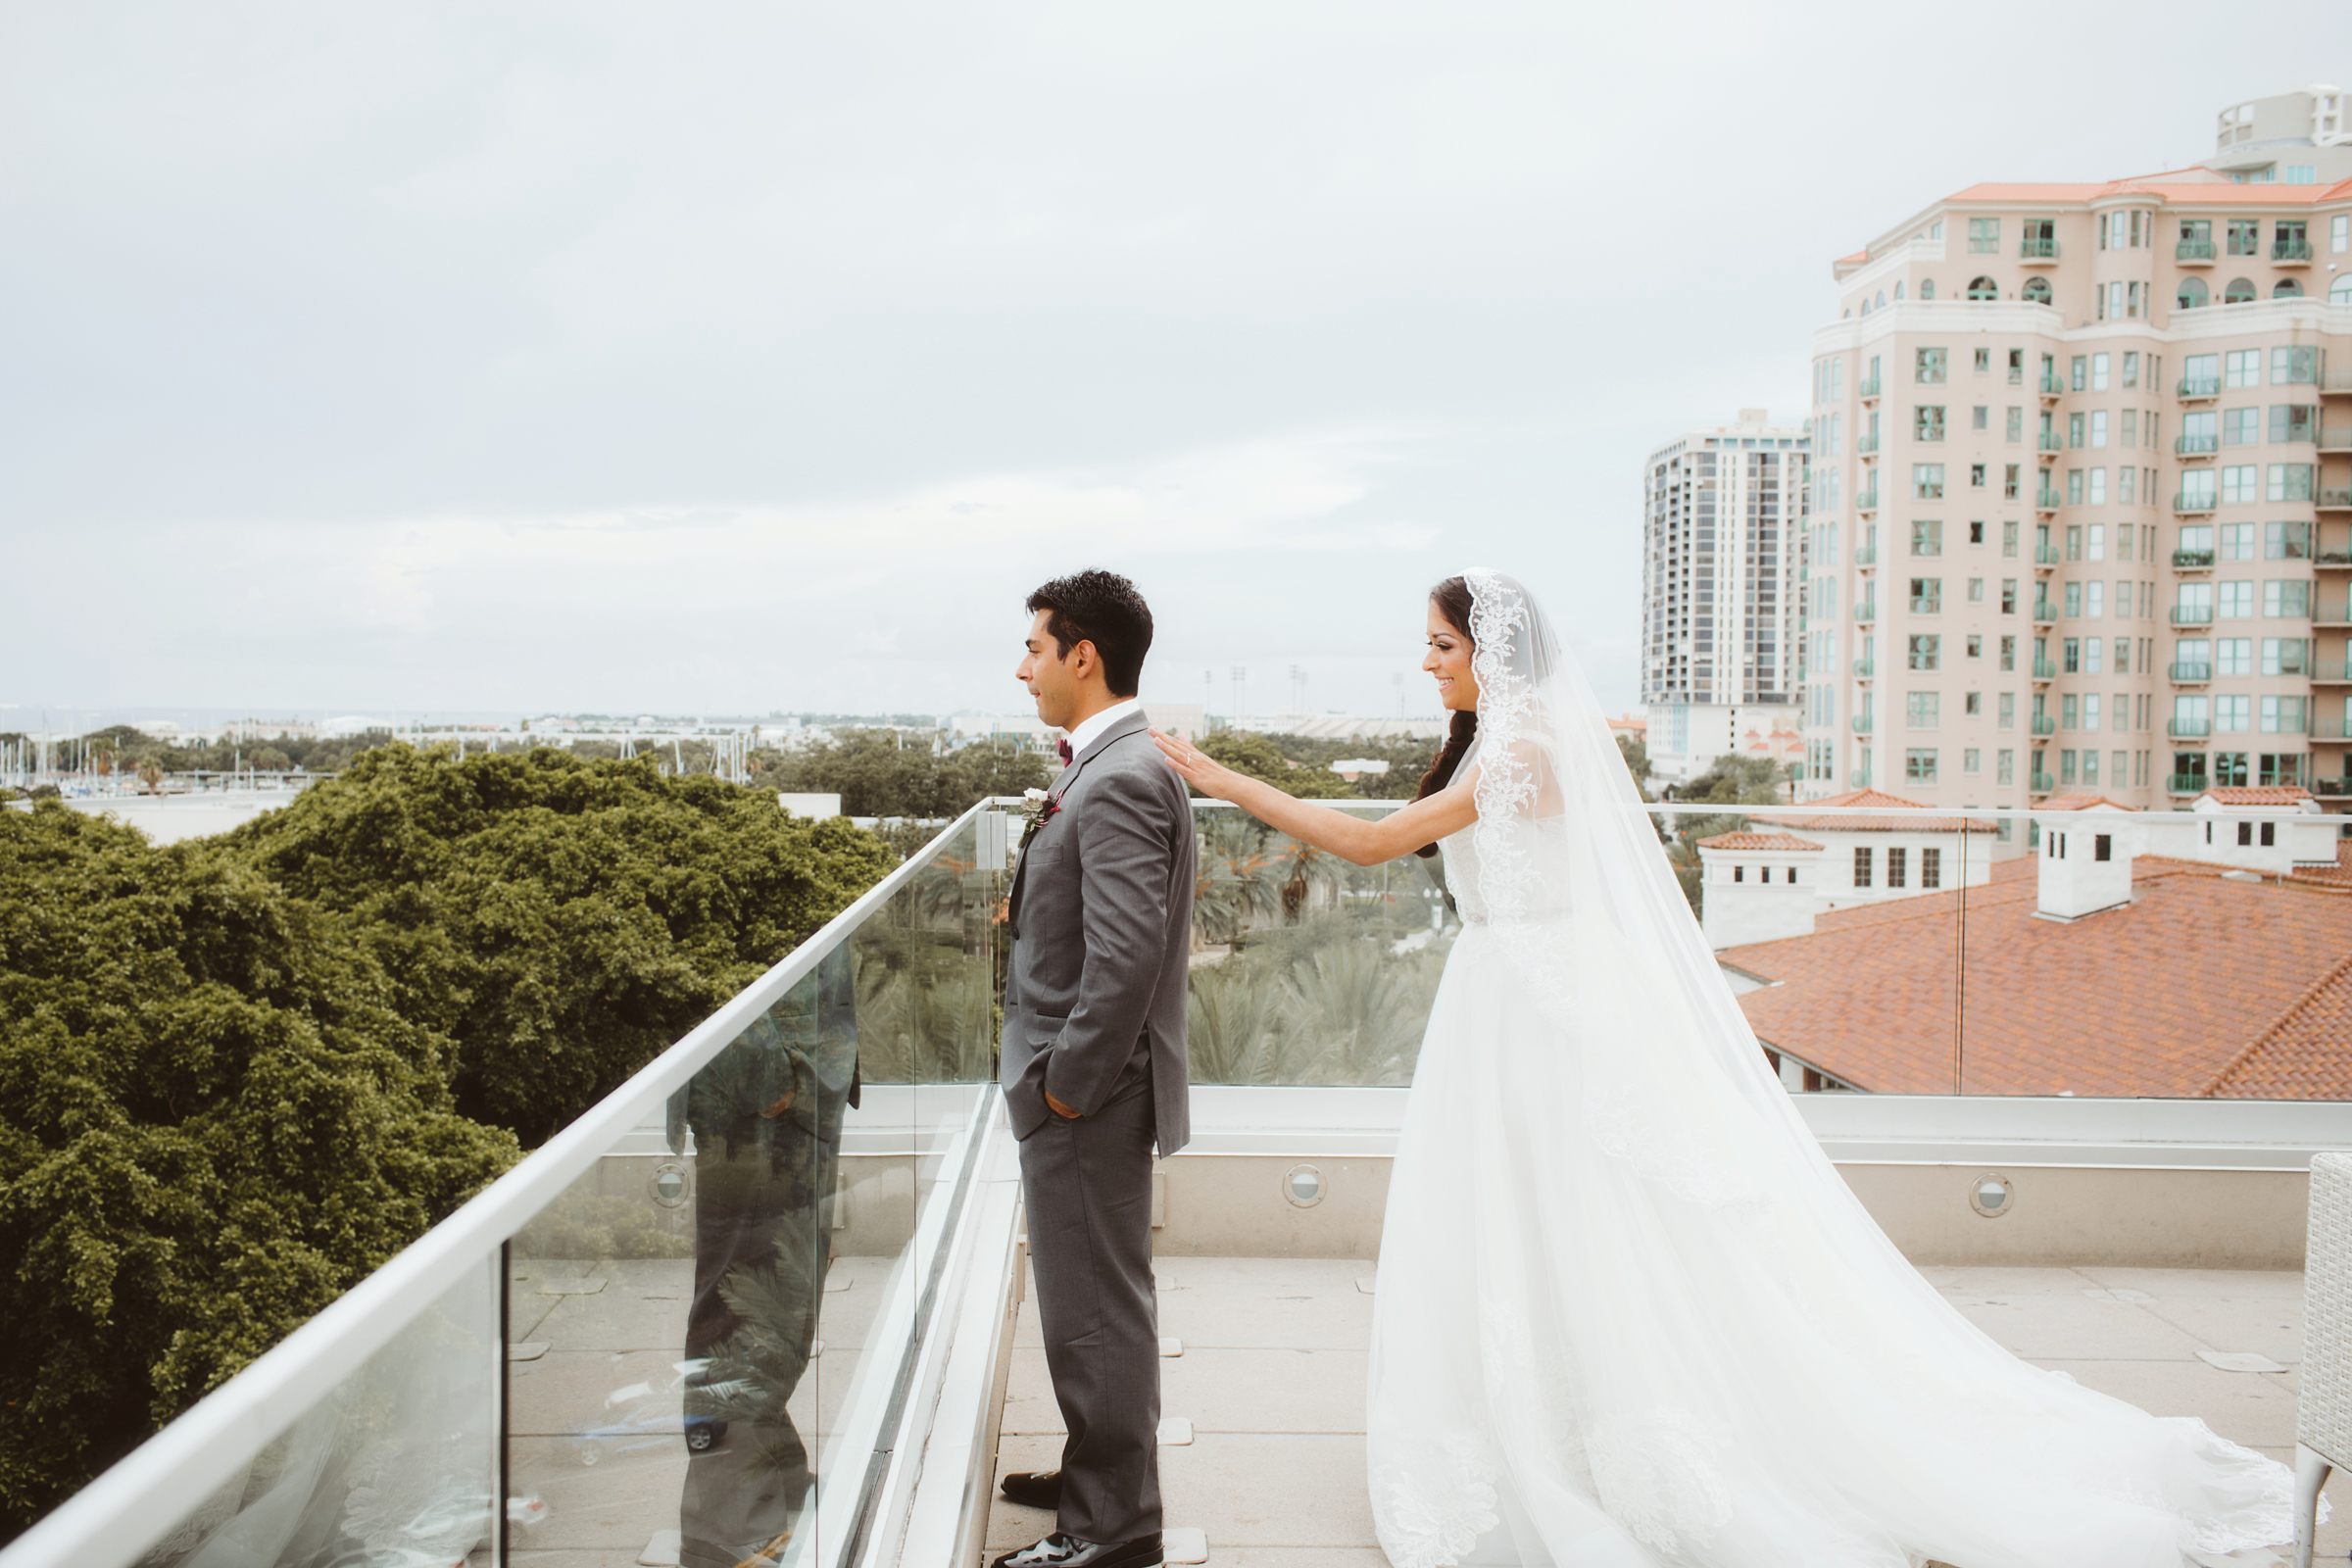 wedding day | MFA St Pete | Vanessa Boy Photography | vanessaboy.com-143.com |final.jpg